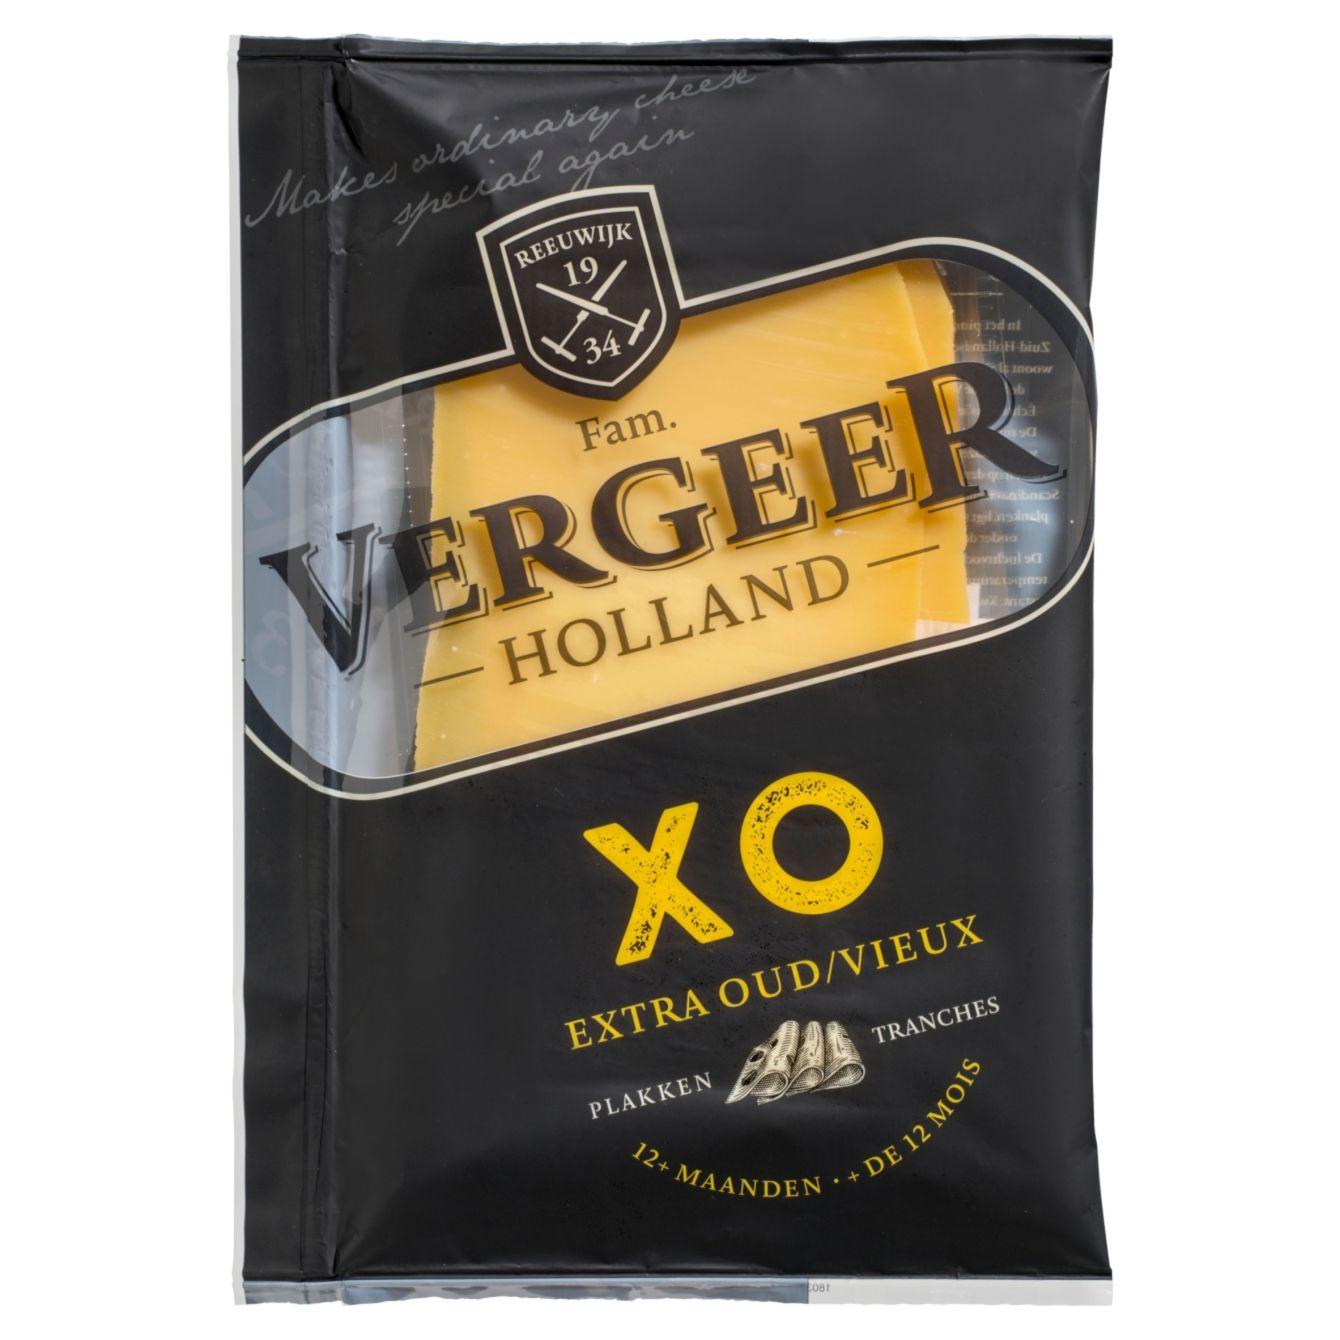 Vergeer Xo Extra Oude Kaas Gesneden